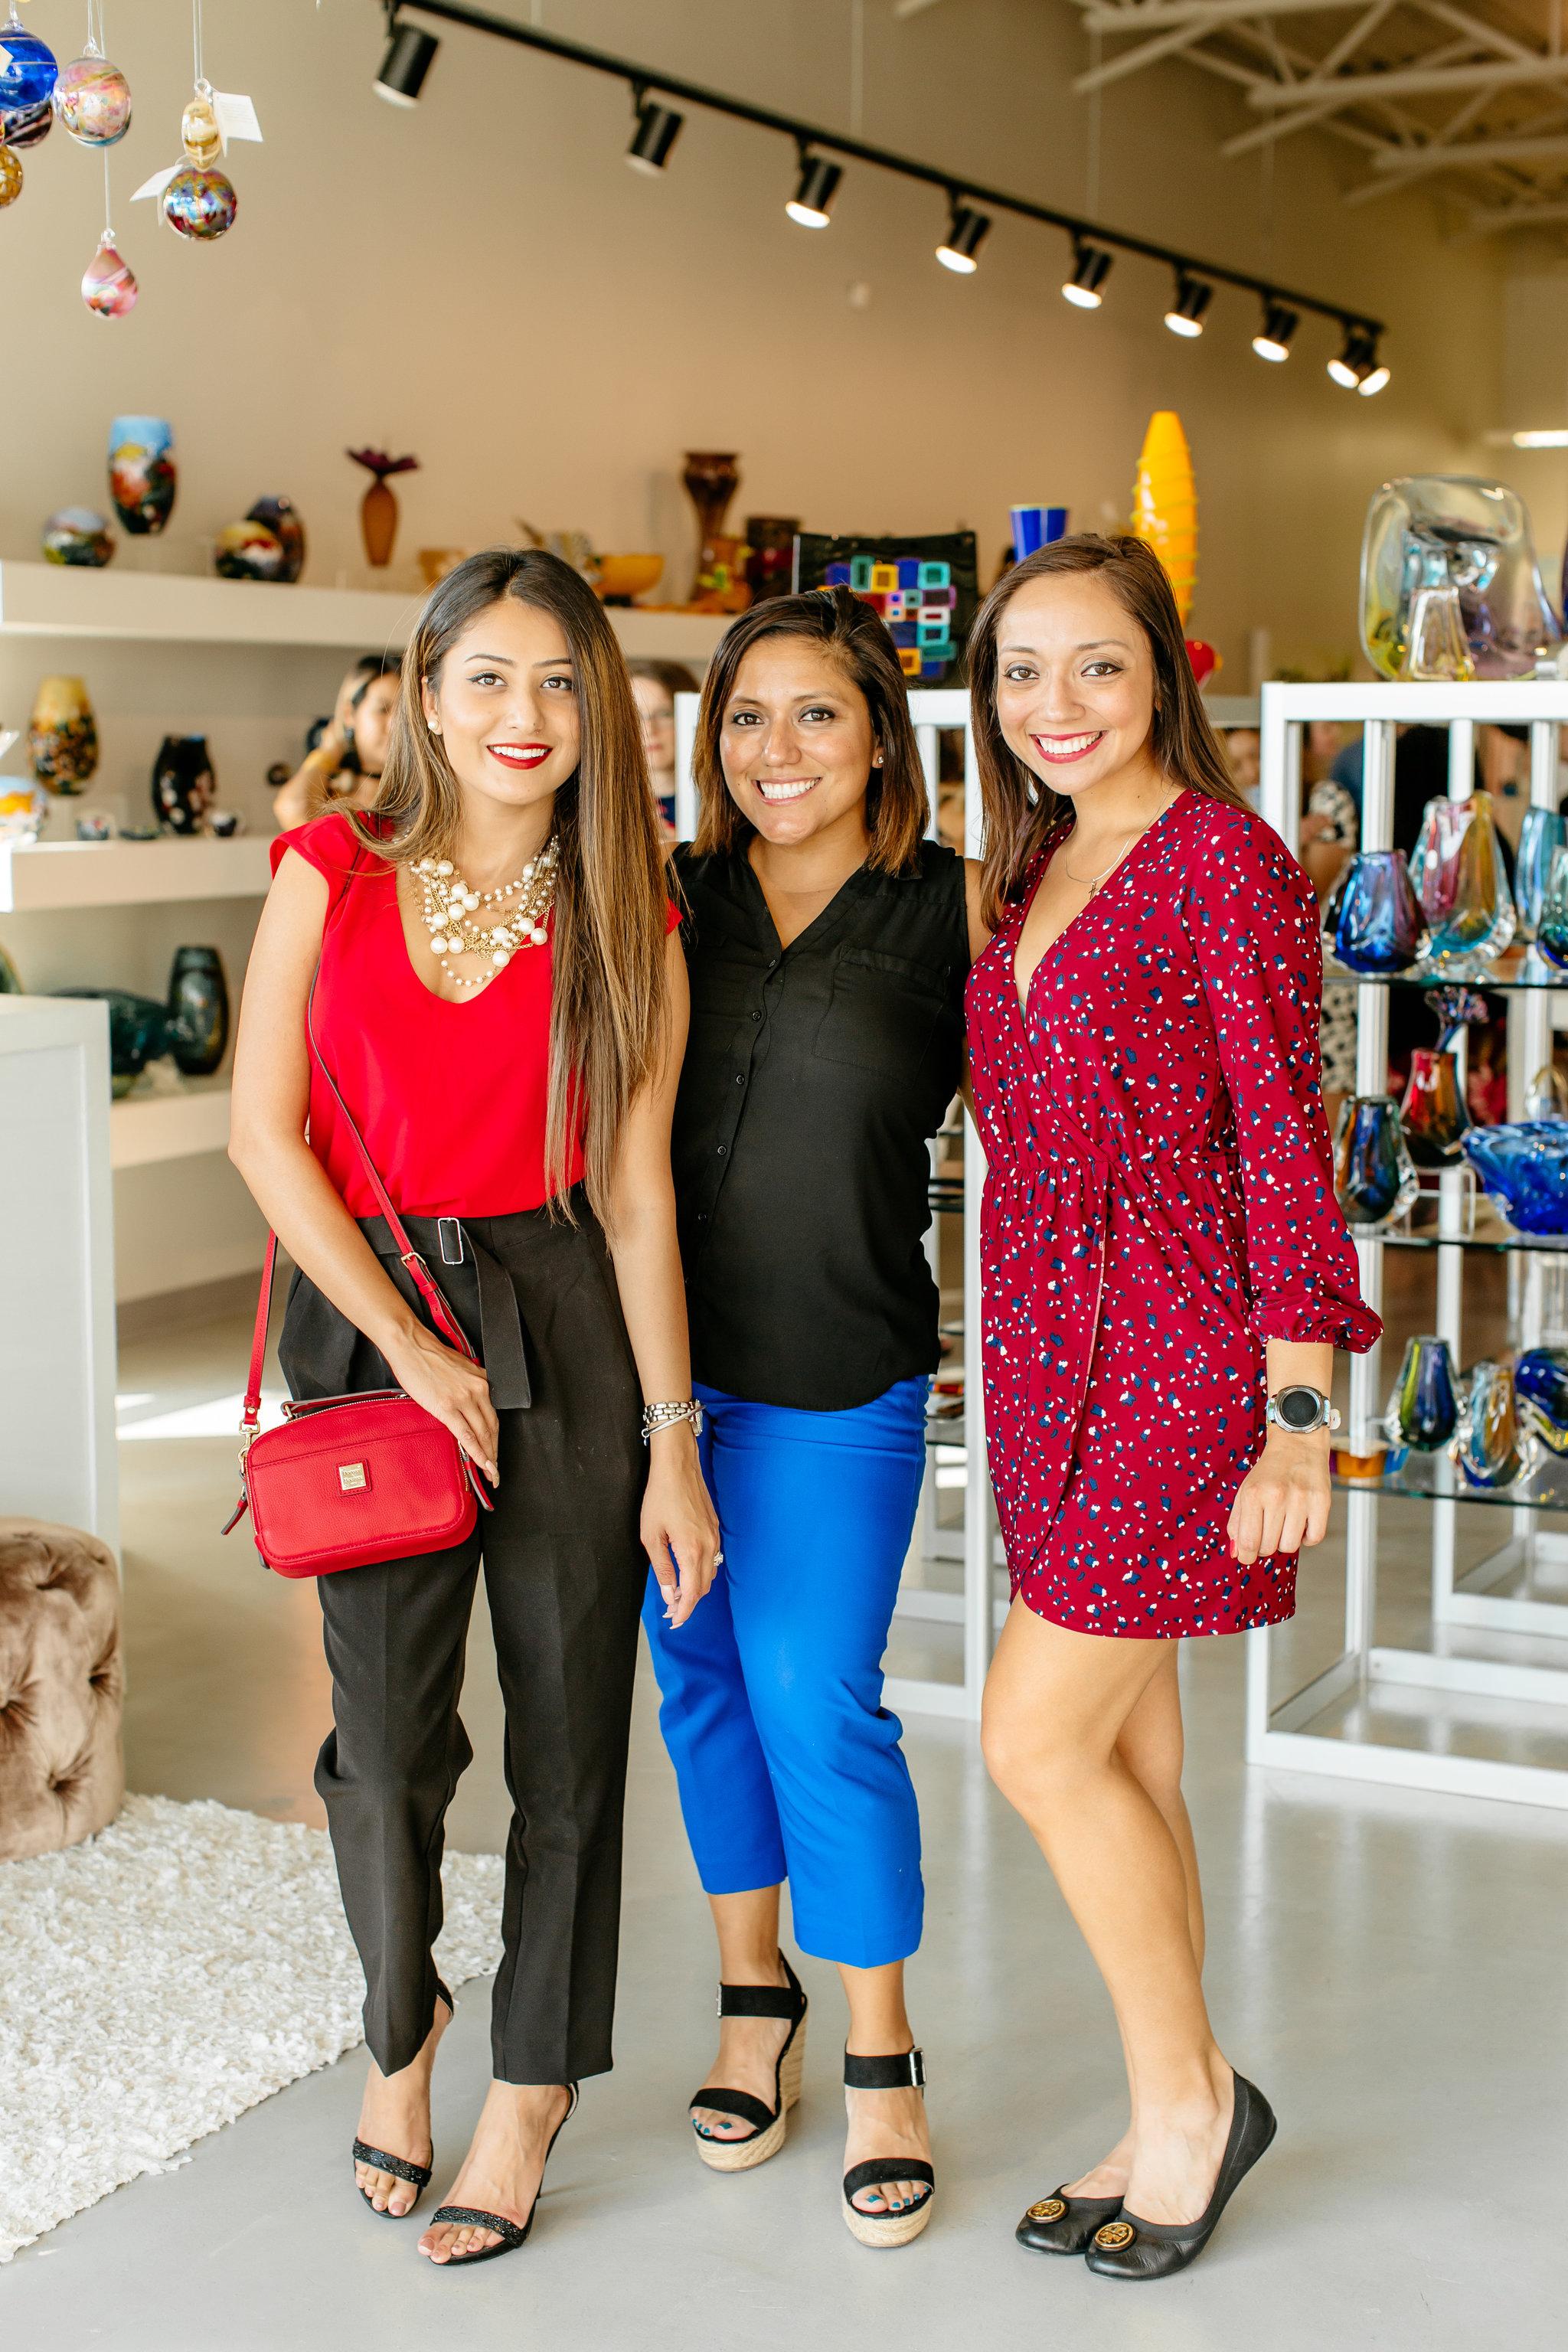 Alexa-Vossler-Photo_Dallas-Event-Photographer_Brite-Bar-Beauty-2018-Lipstick-Launch-Party-9.jpg